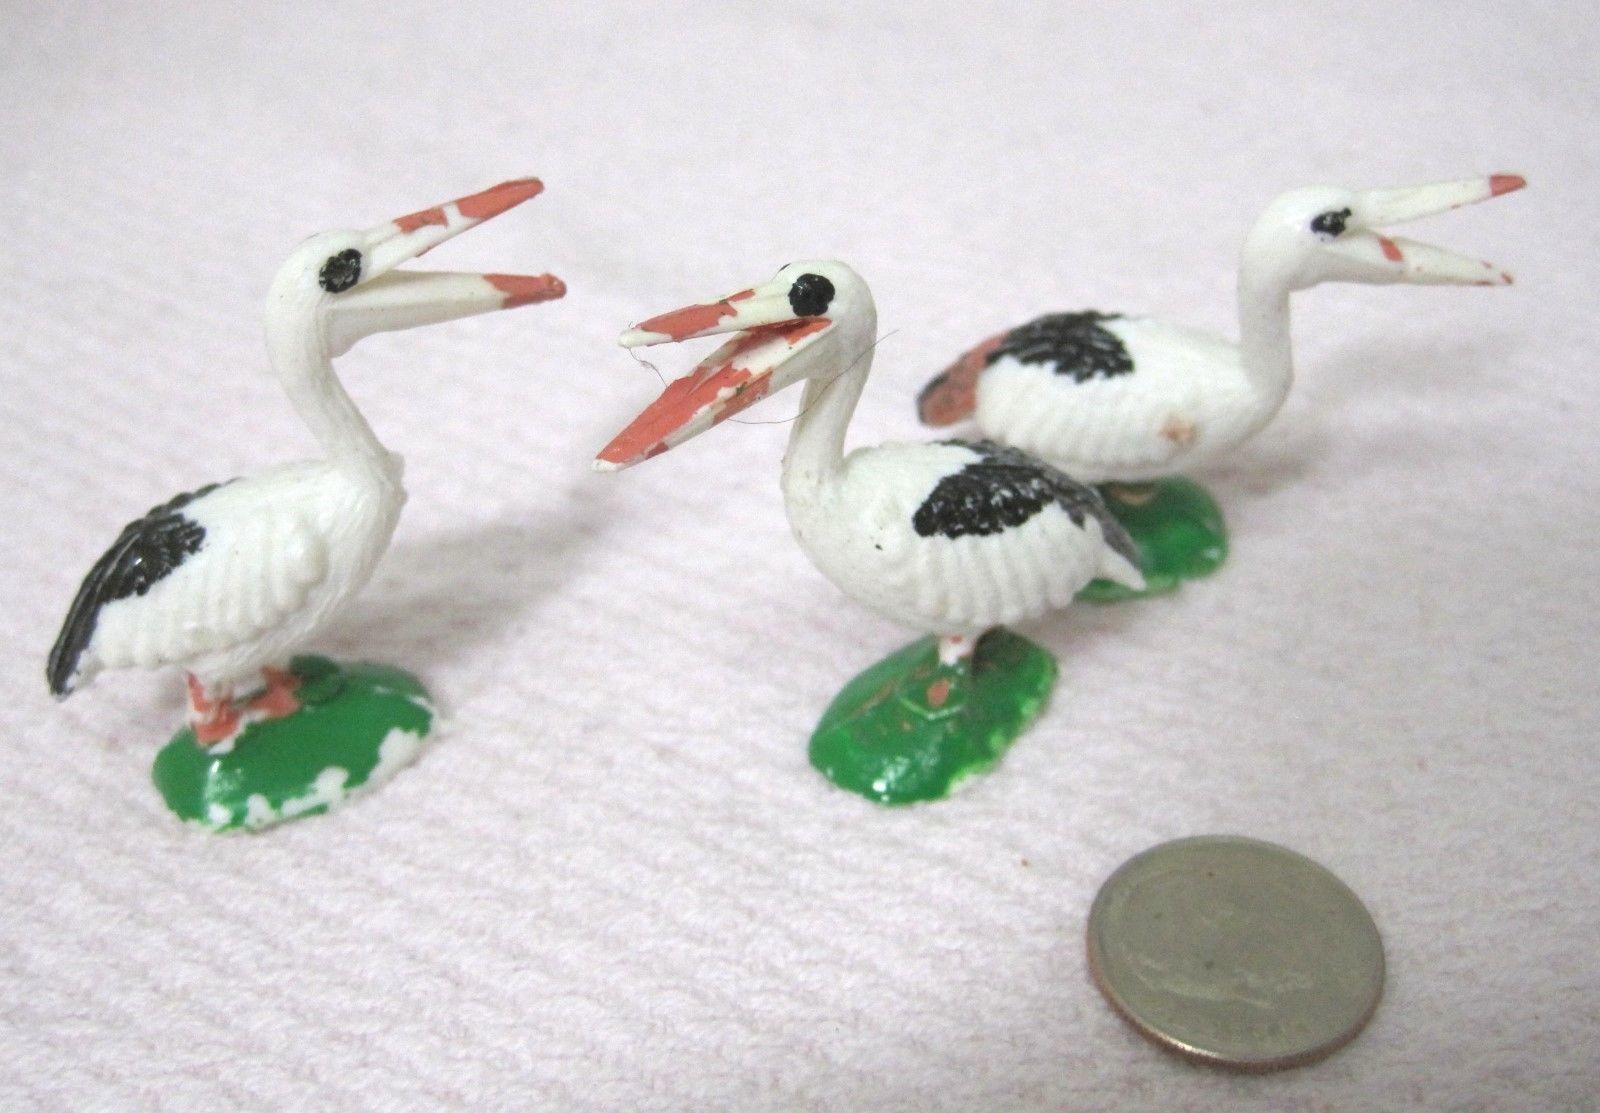 Vintage Miniature Bird Stork Pelican 1 5/8 x 1 1/2  Inches  Crafts 3 PC image 2